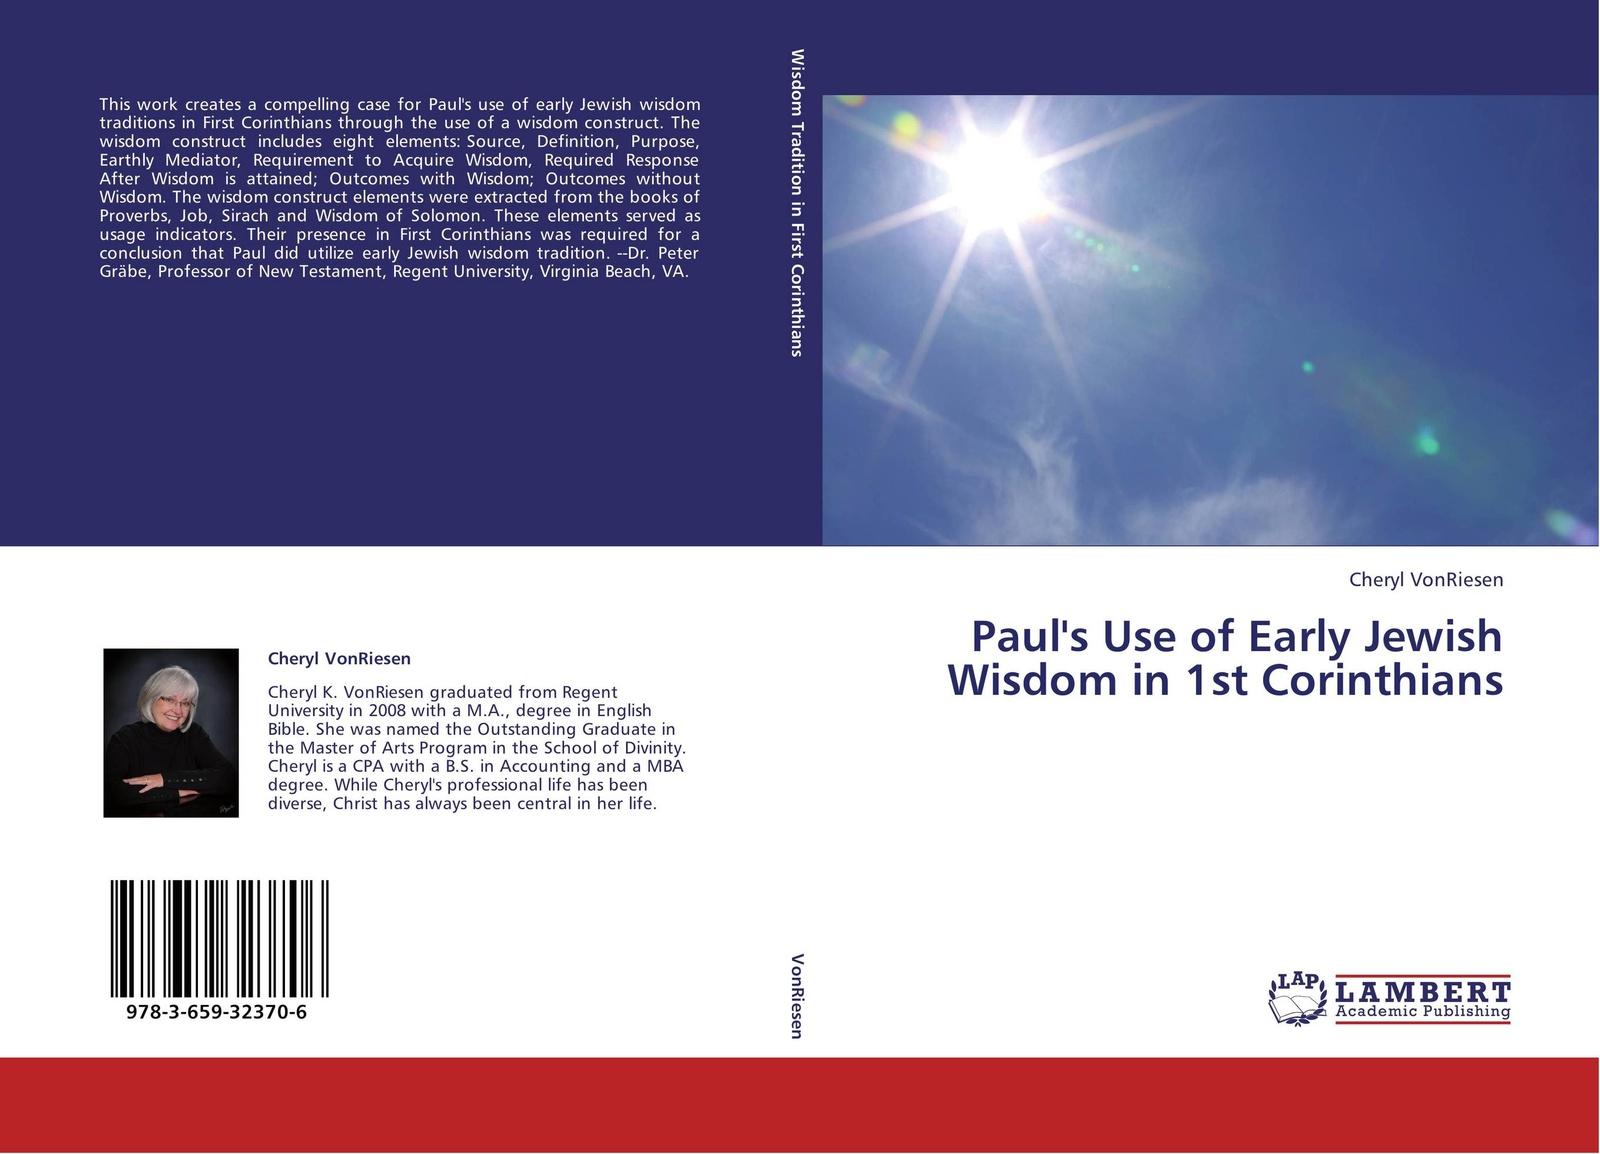 Cheryl VonRiesen Paul's Use of Early Jewish Wisdom in 1st Corinthians the wisdom of unicorns